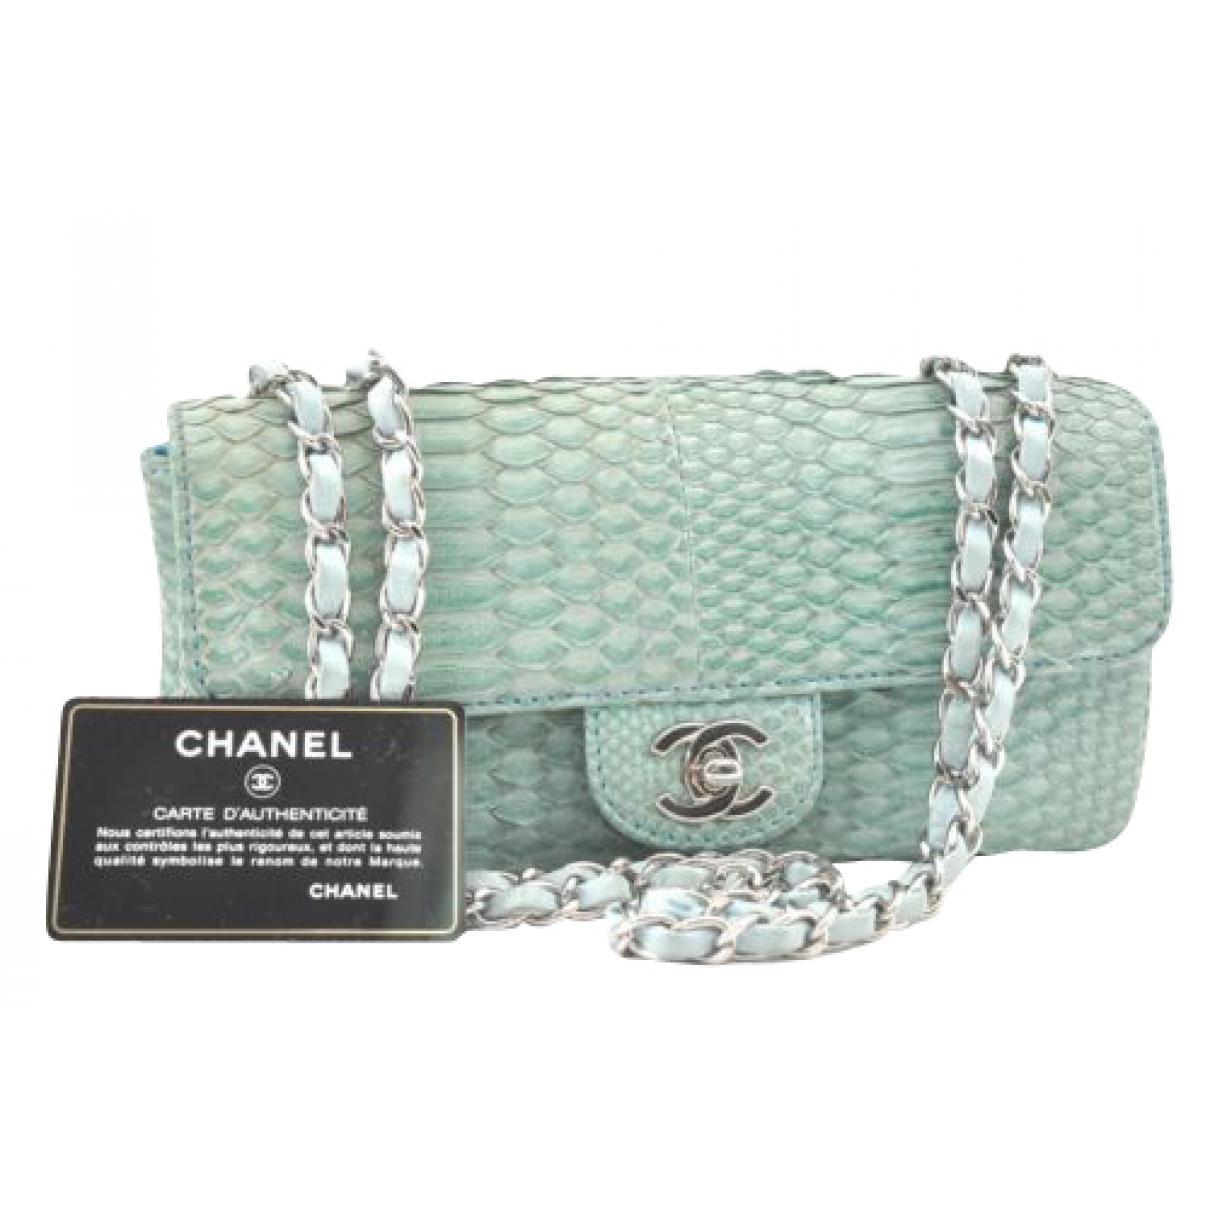 2f32f376147d42 Chanel Pre-owned Blue Python Handbag in Blue - Lyst